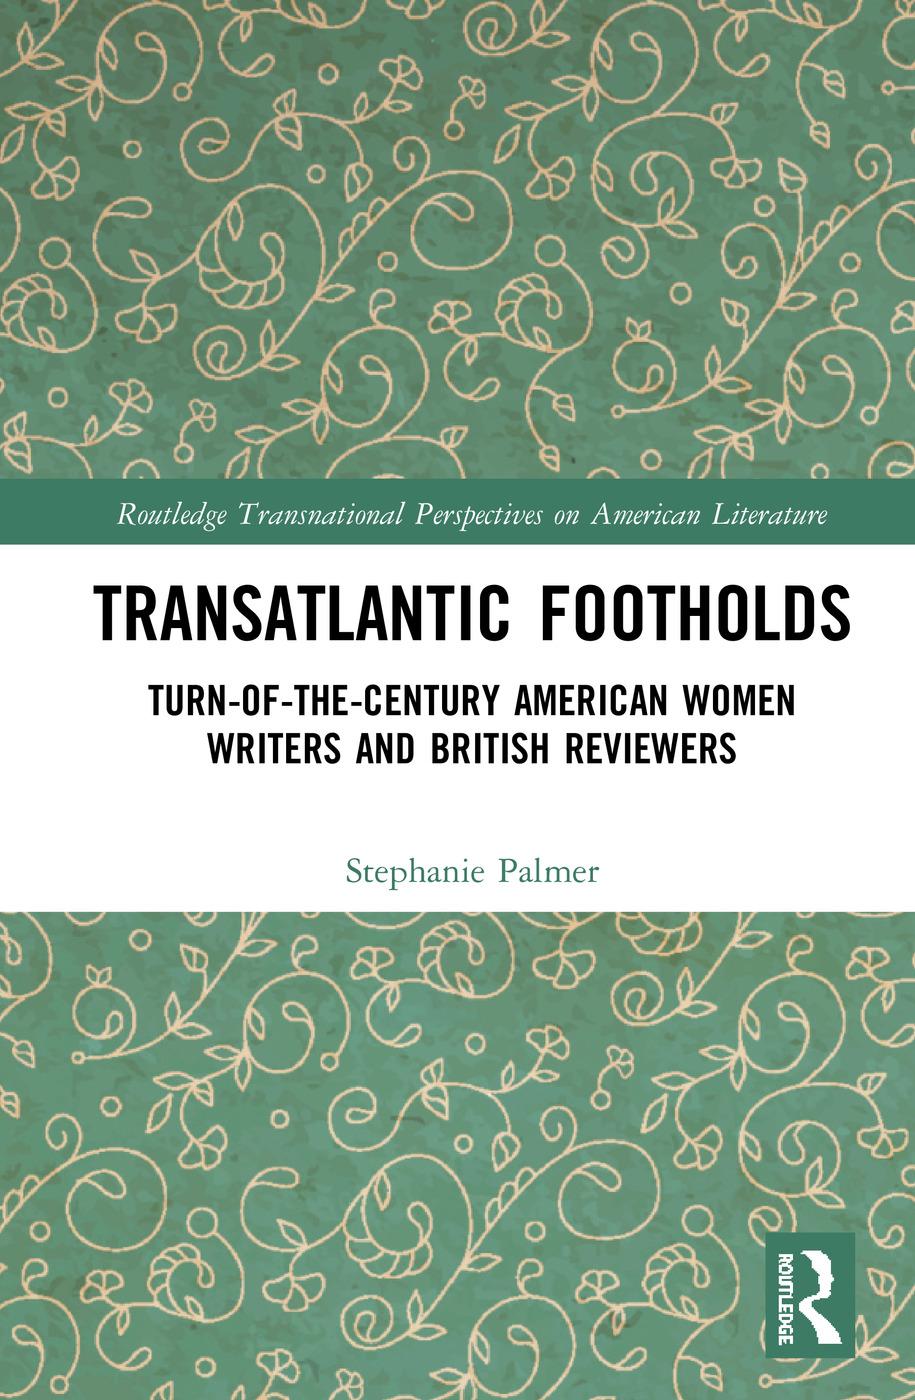 Transatlantic Footholds